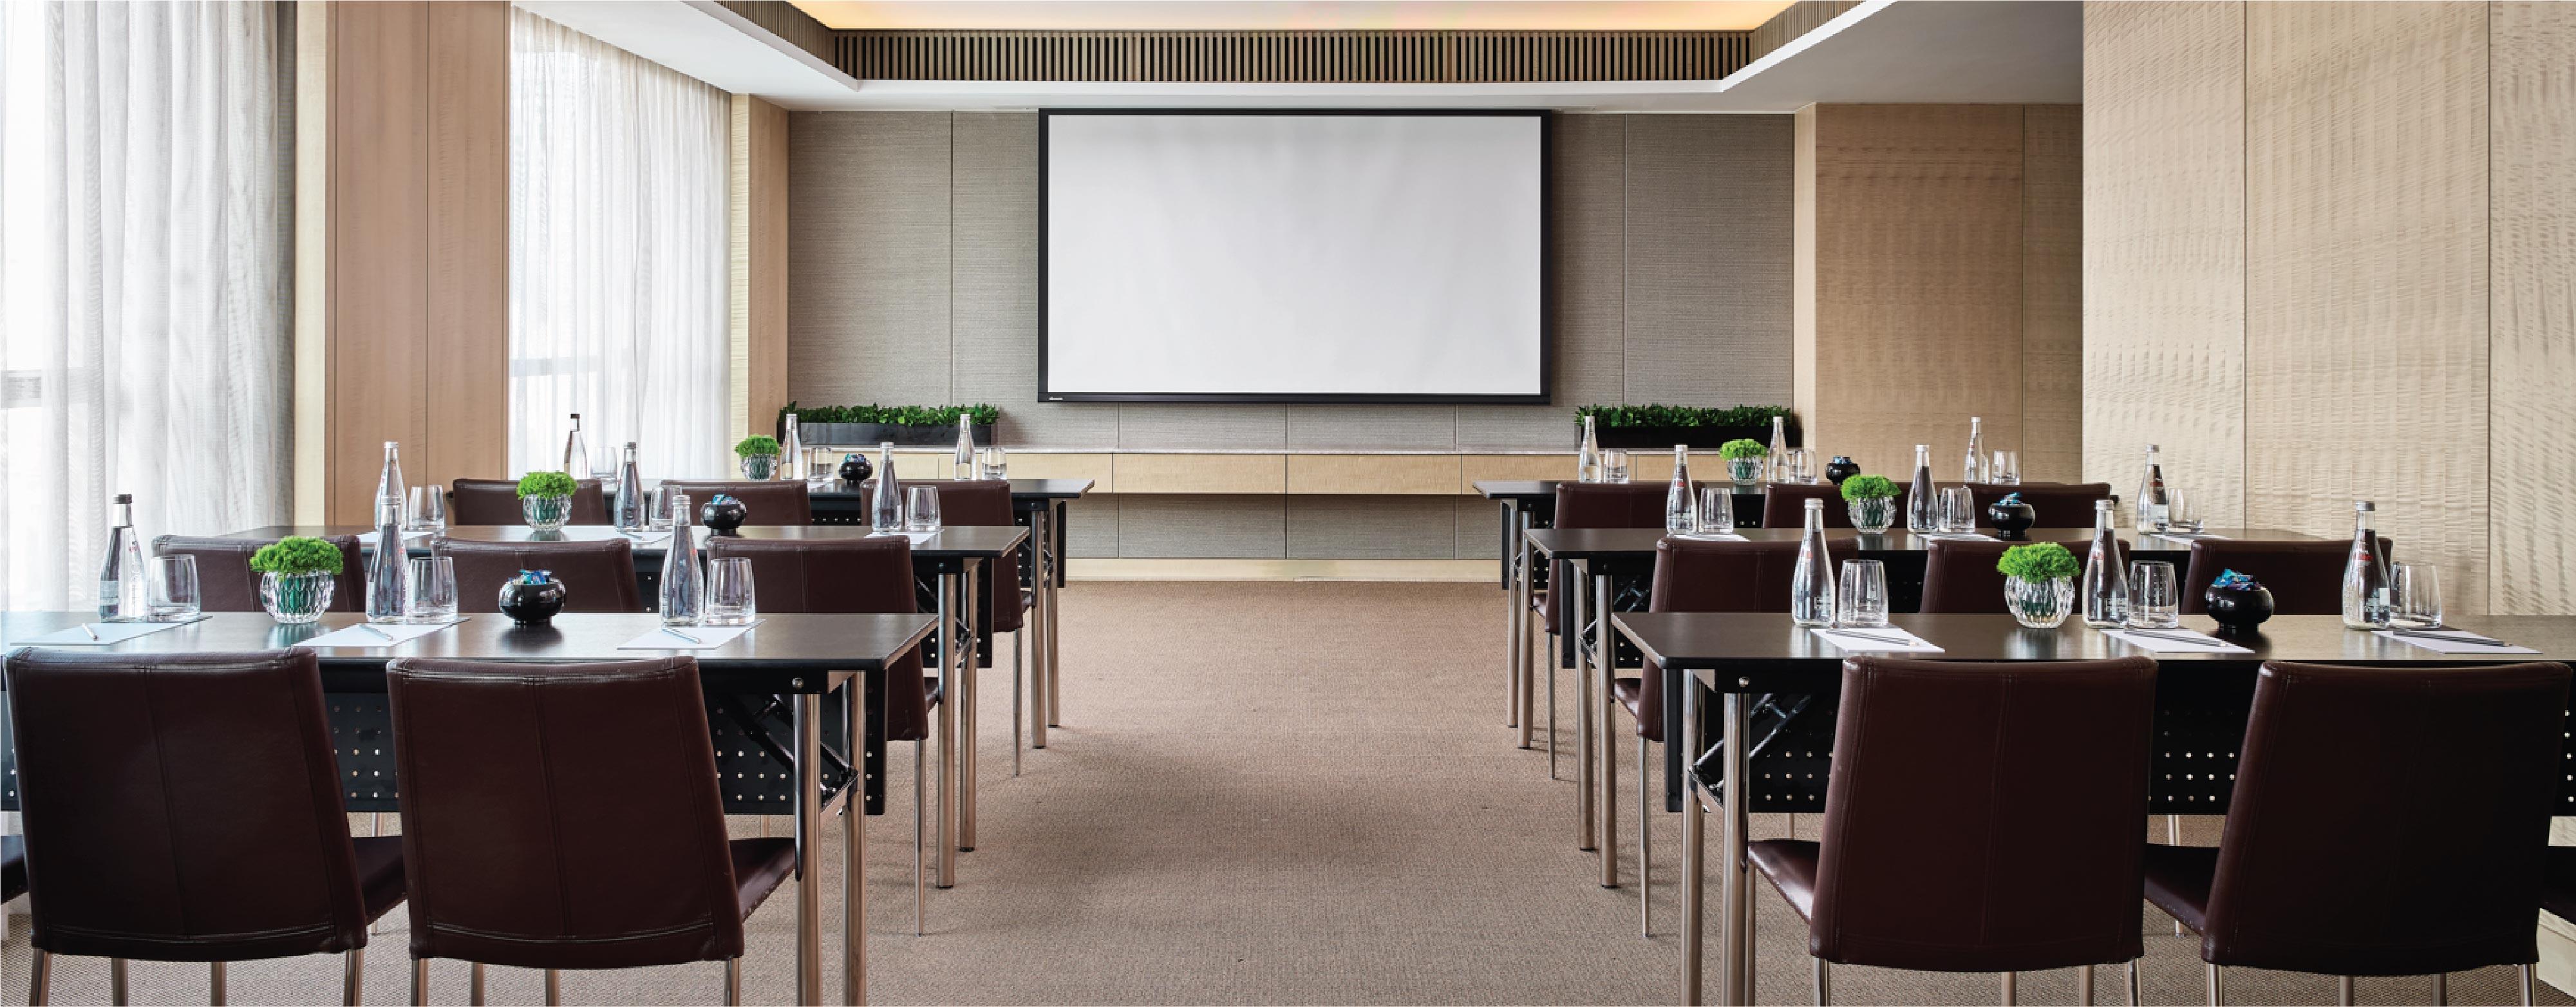 meeting rooms in saigon